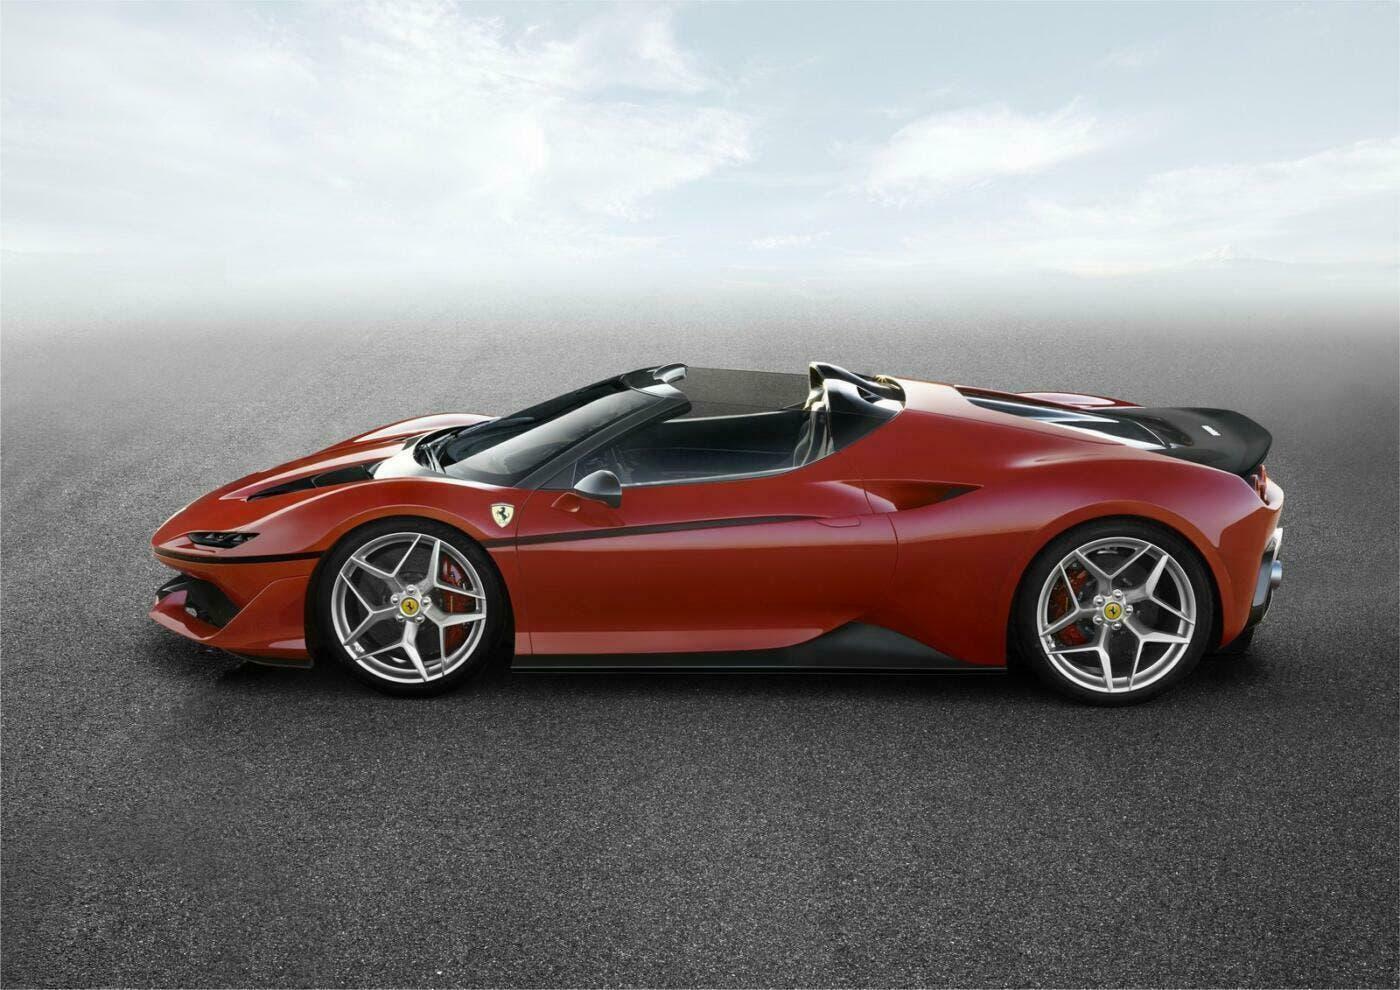 Ferrari J50 esemplare in vendita